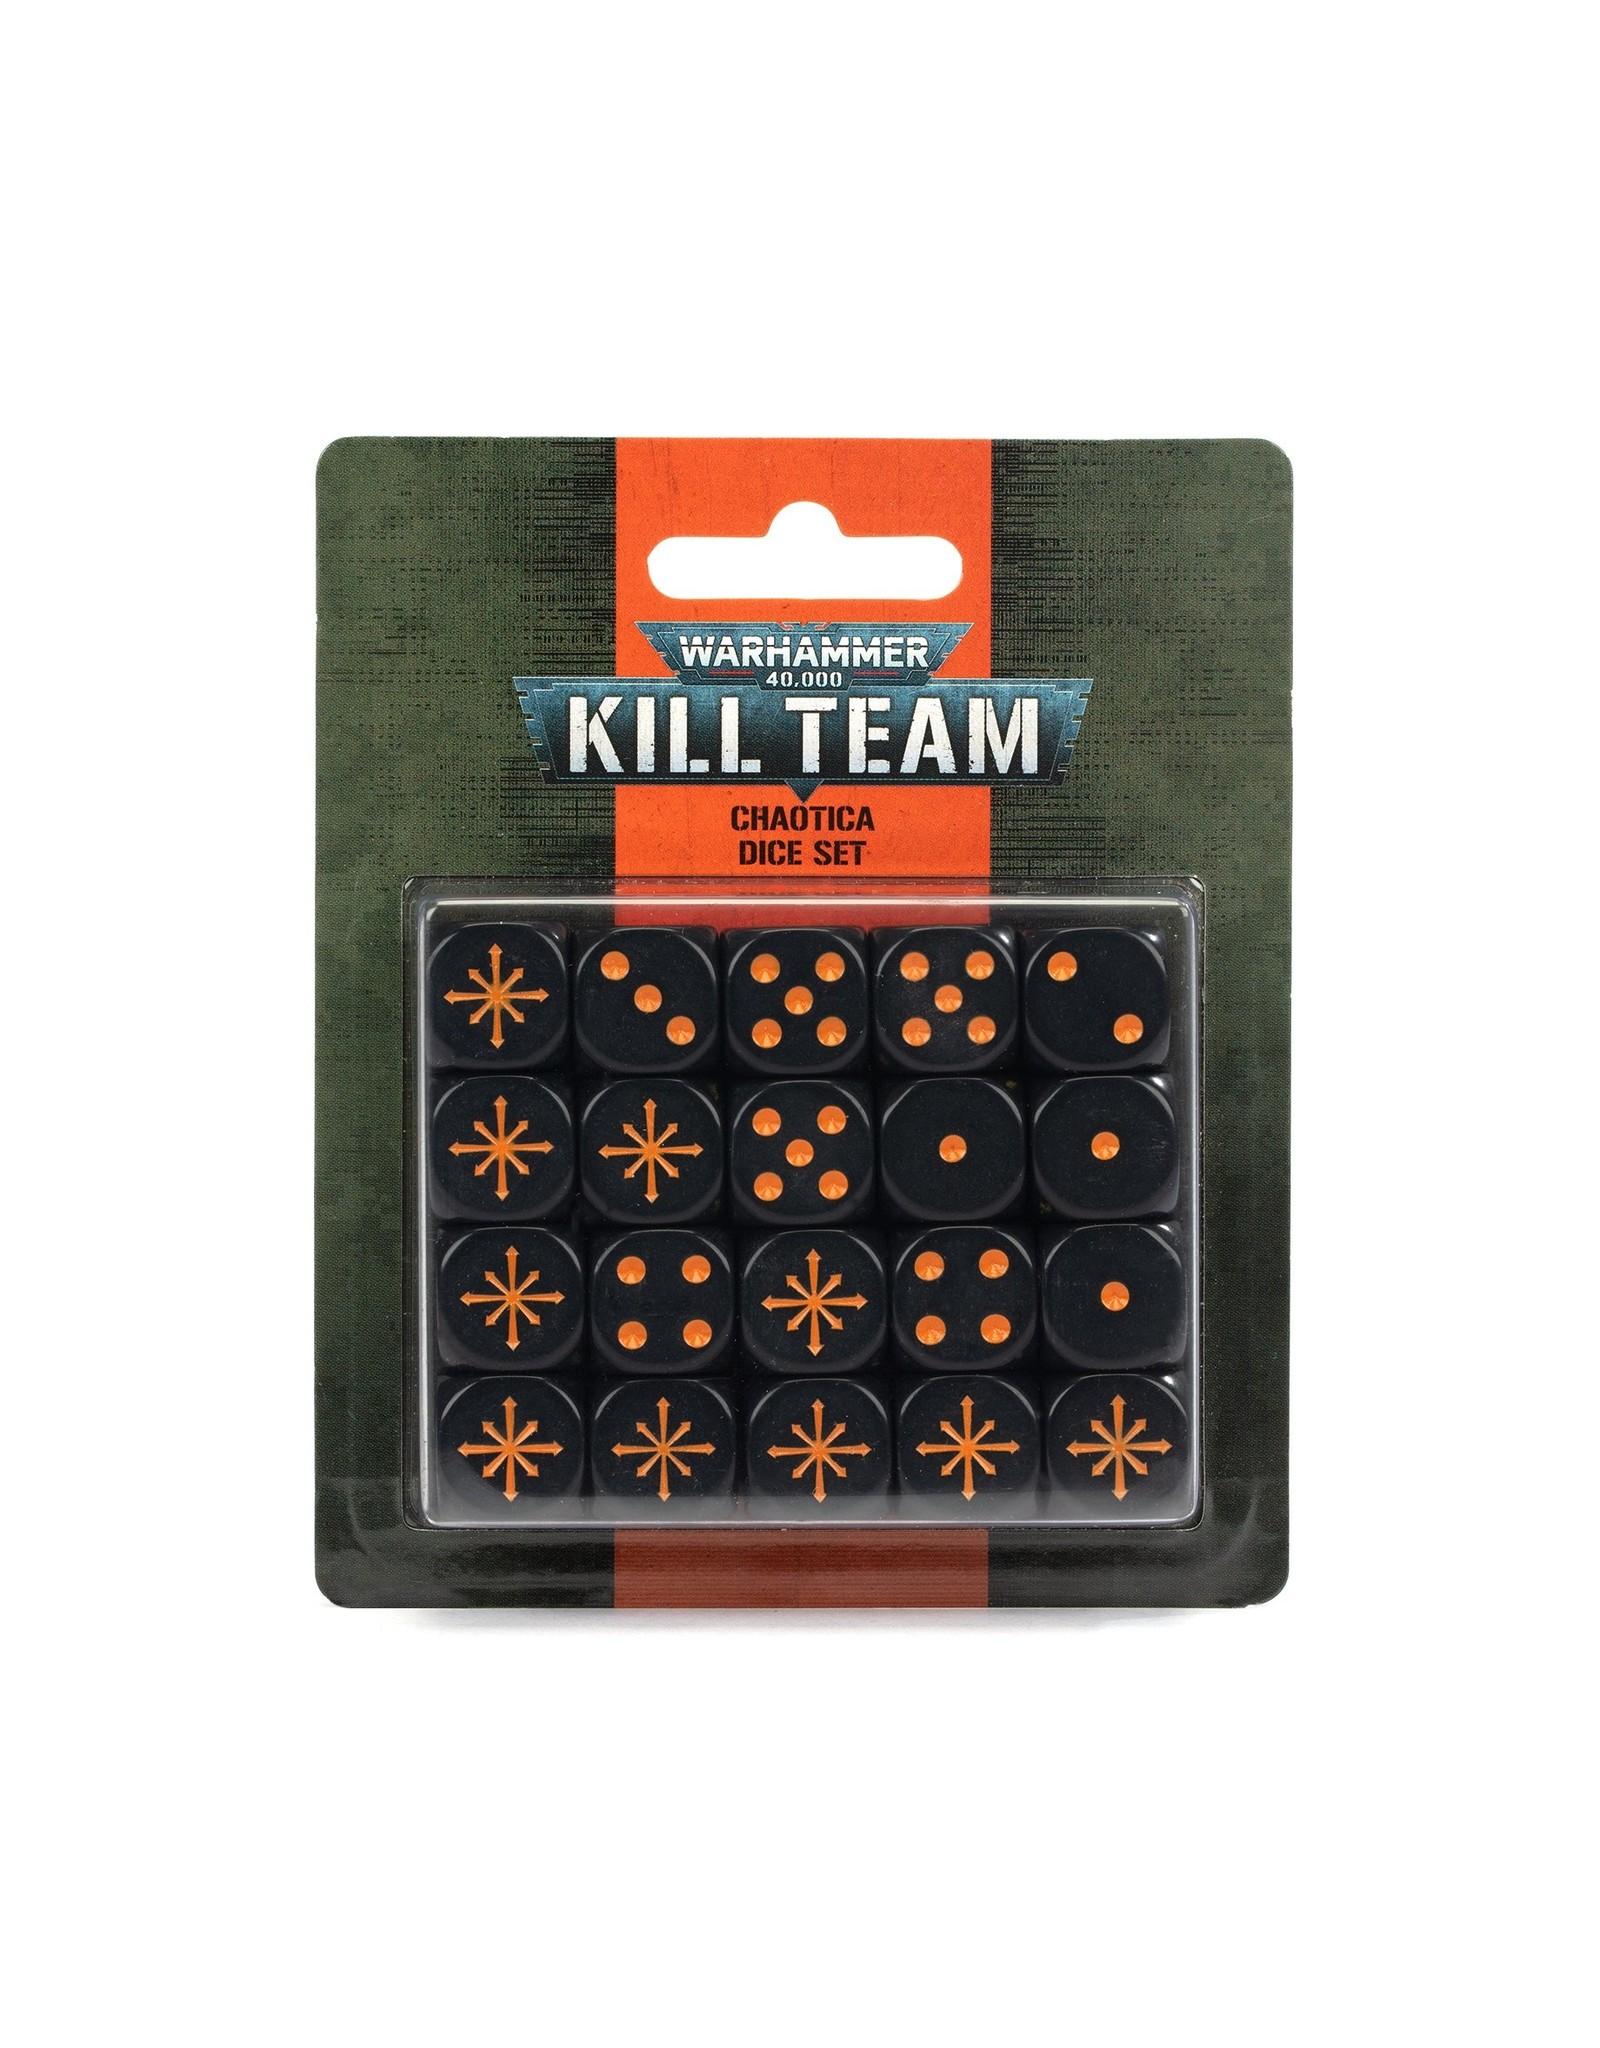 Kill Team Kill Team: Chaotica Dice Set